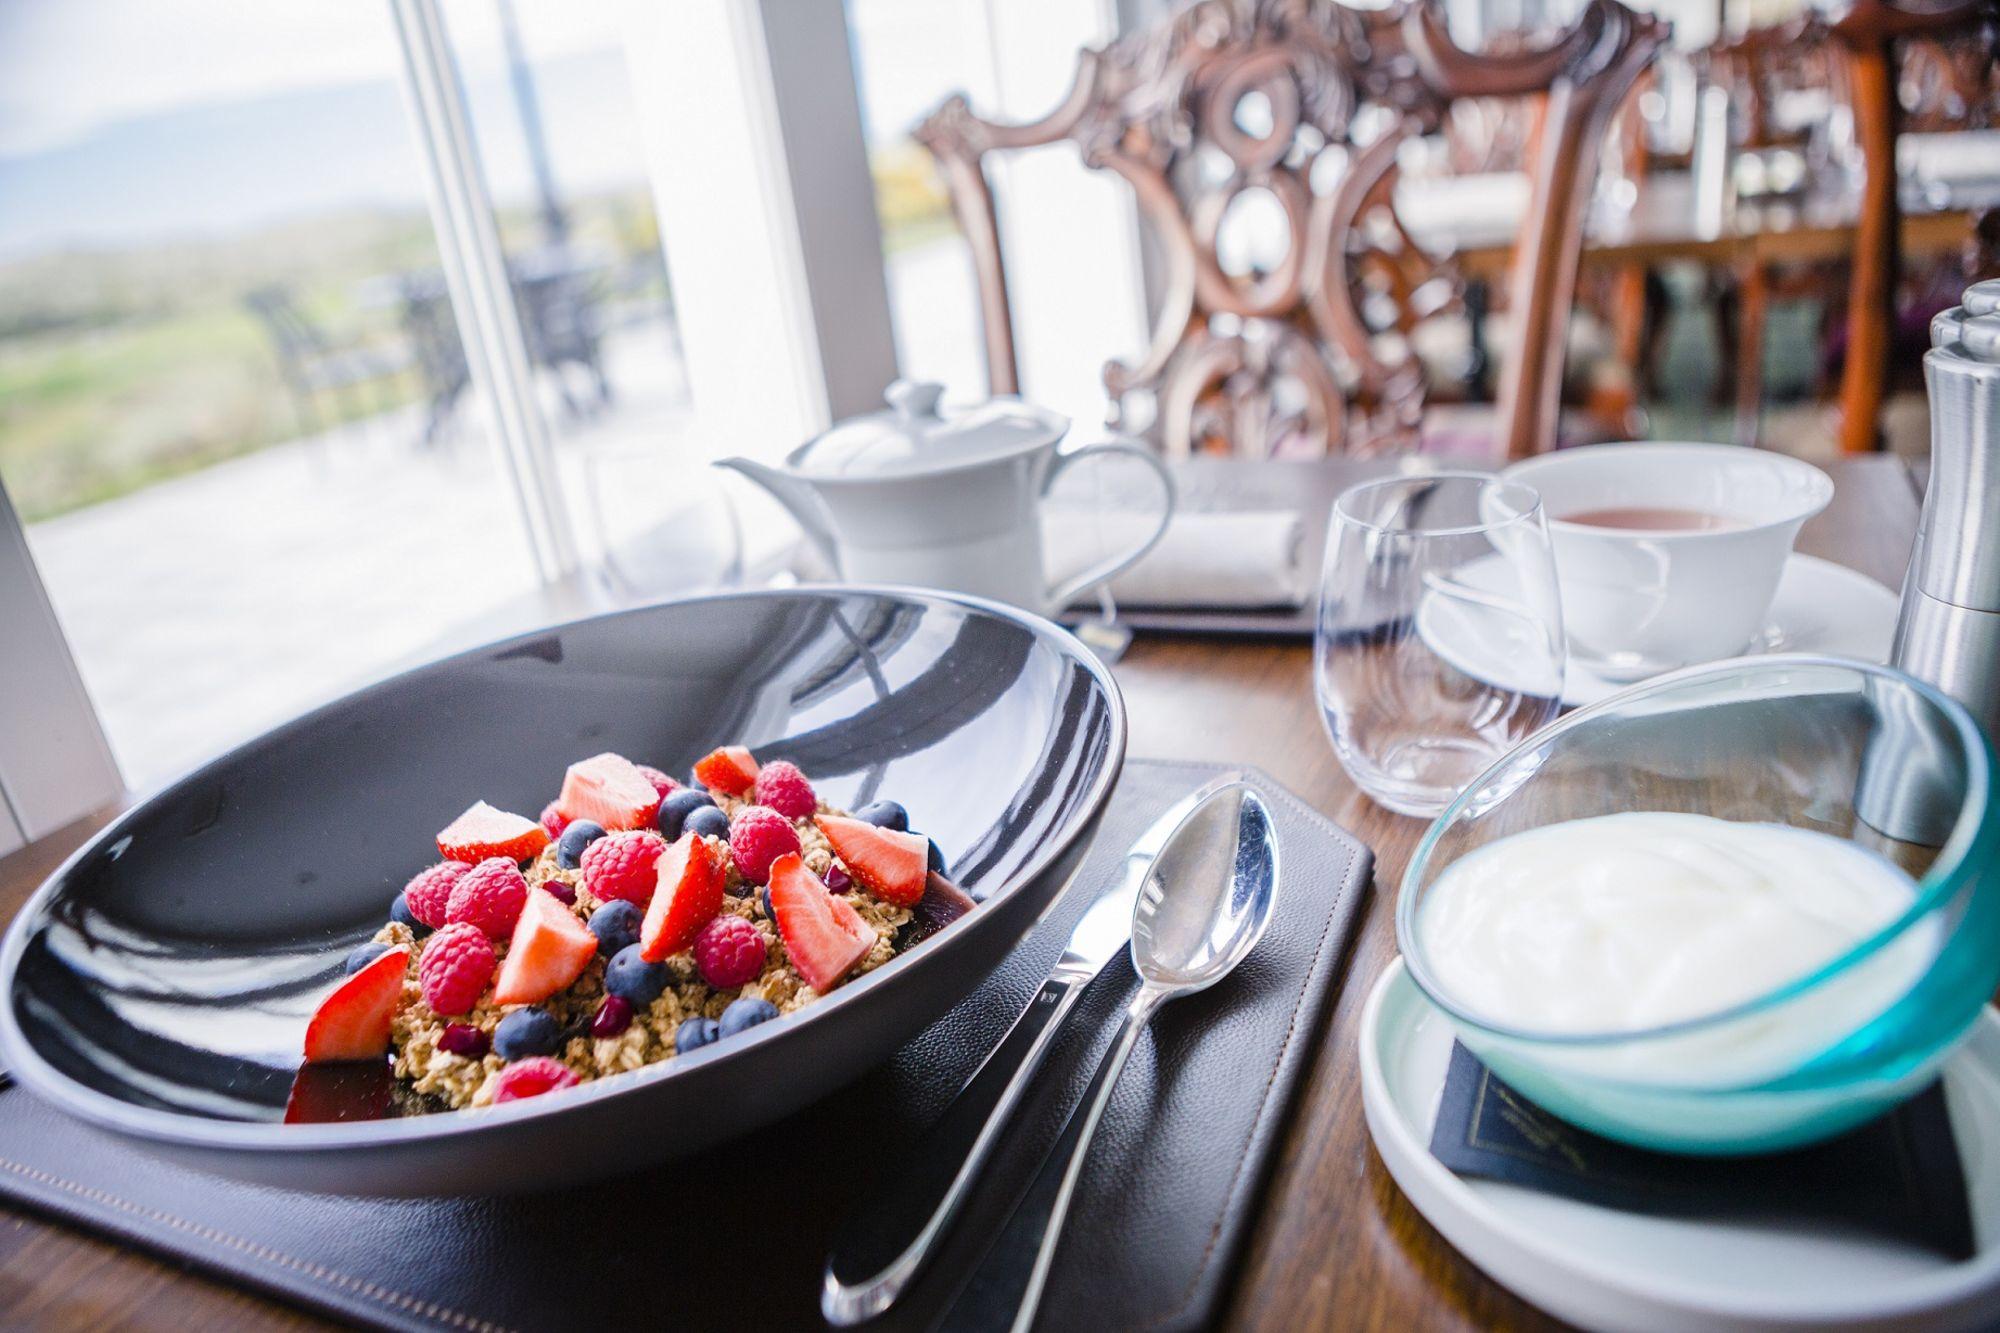 Bowls of granola/fruit and yogurt